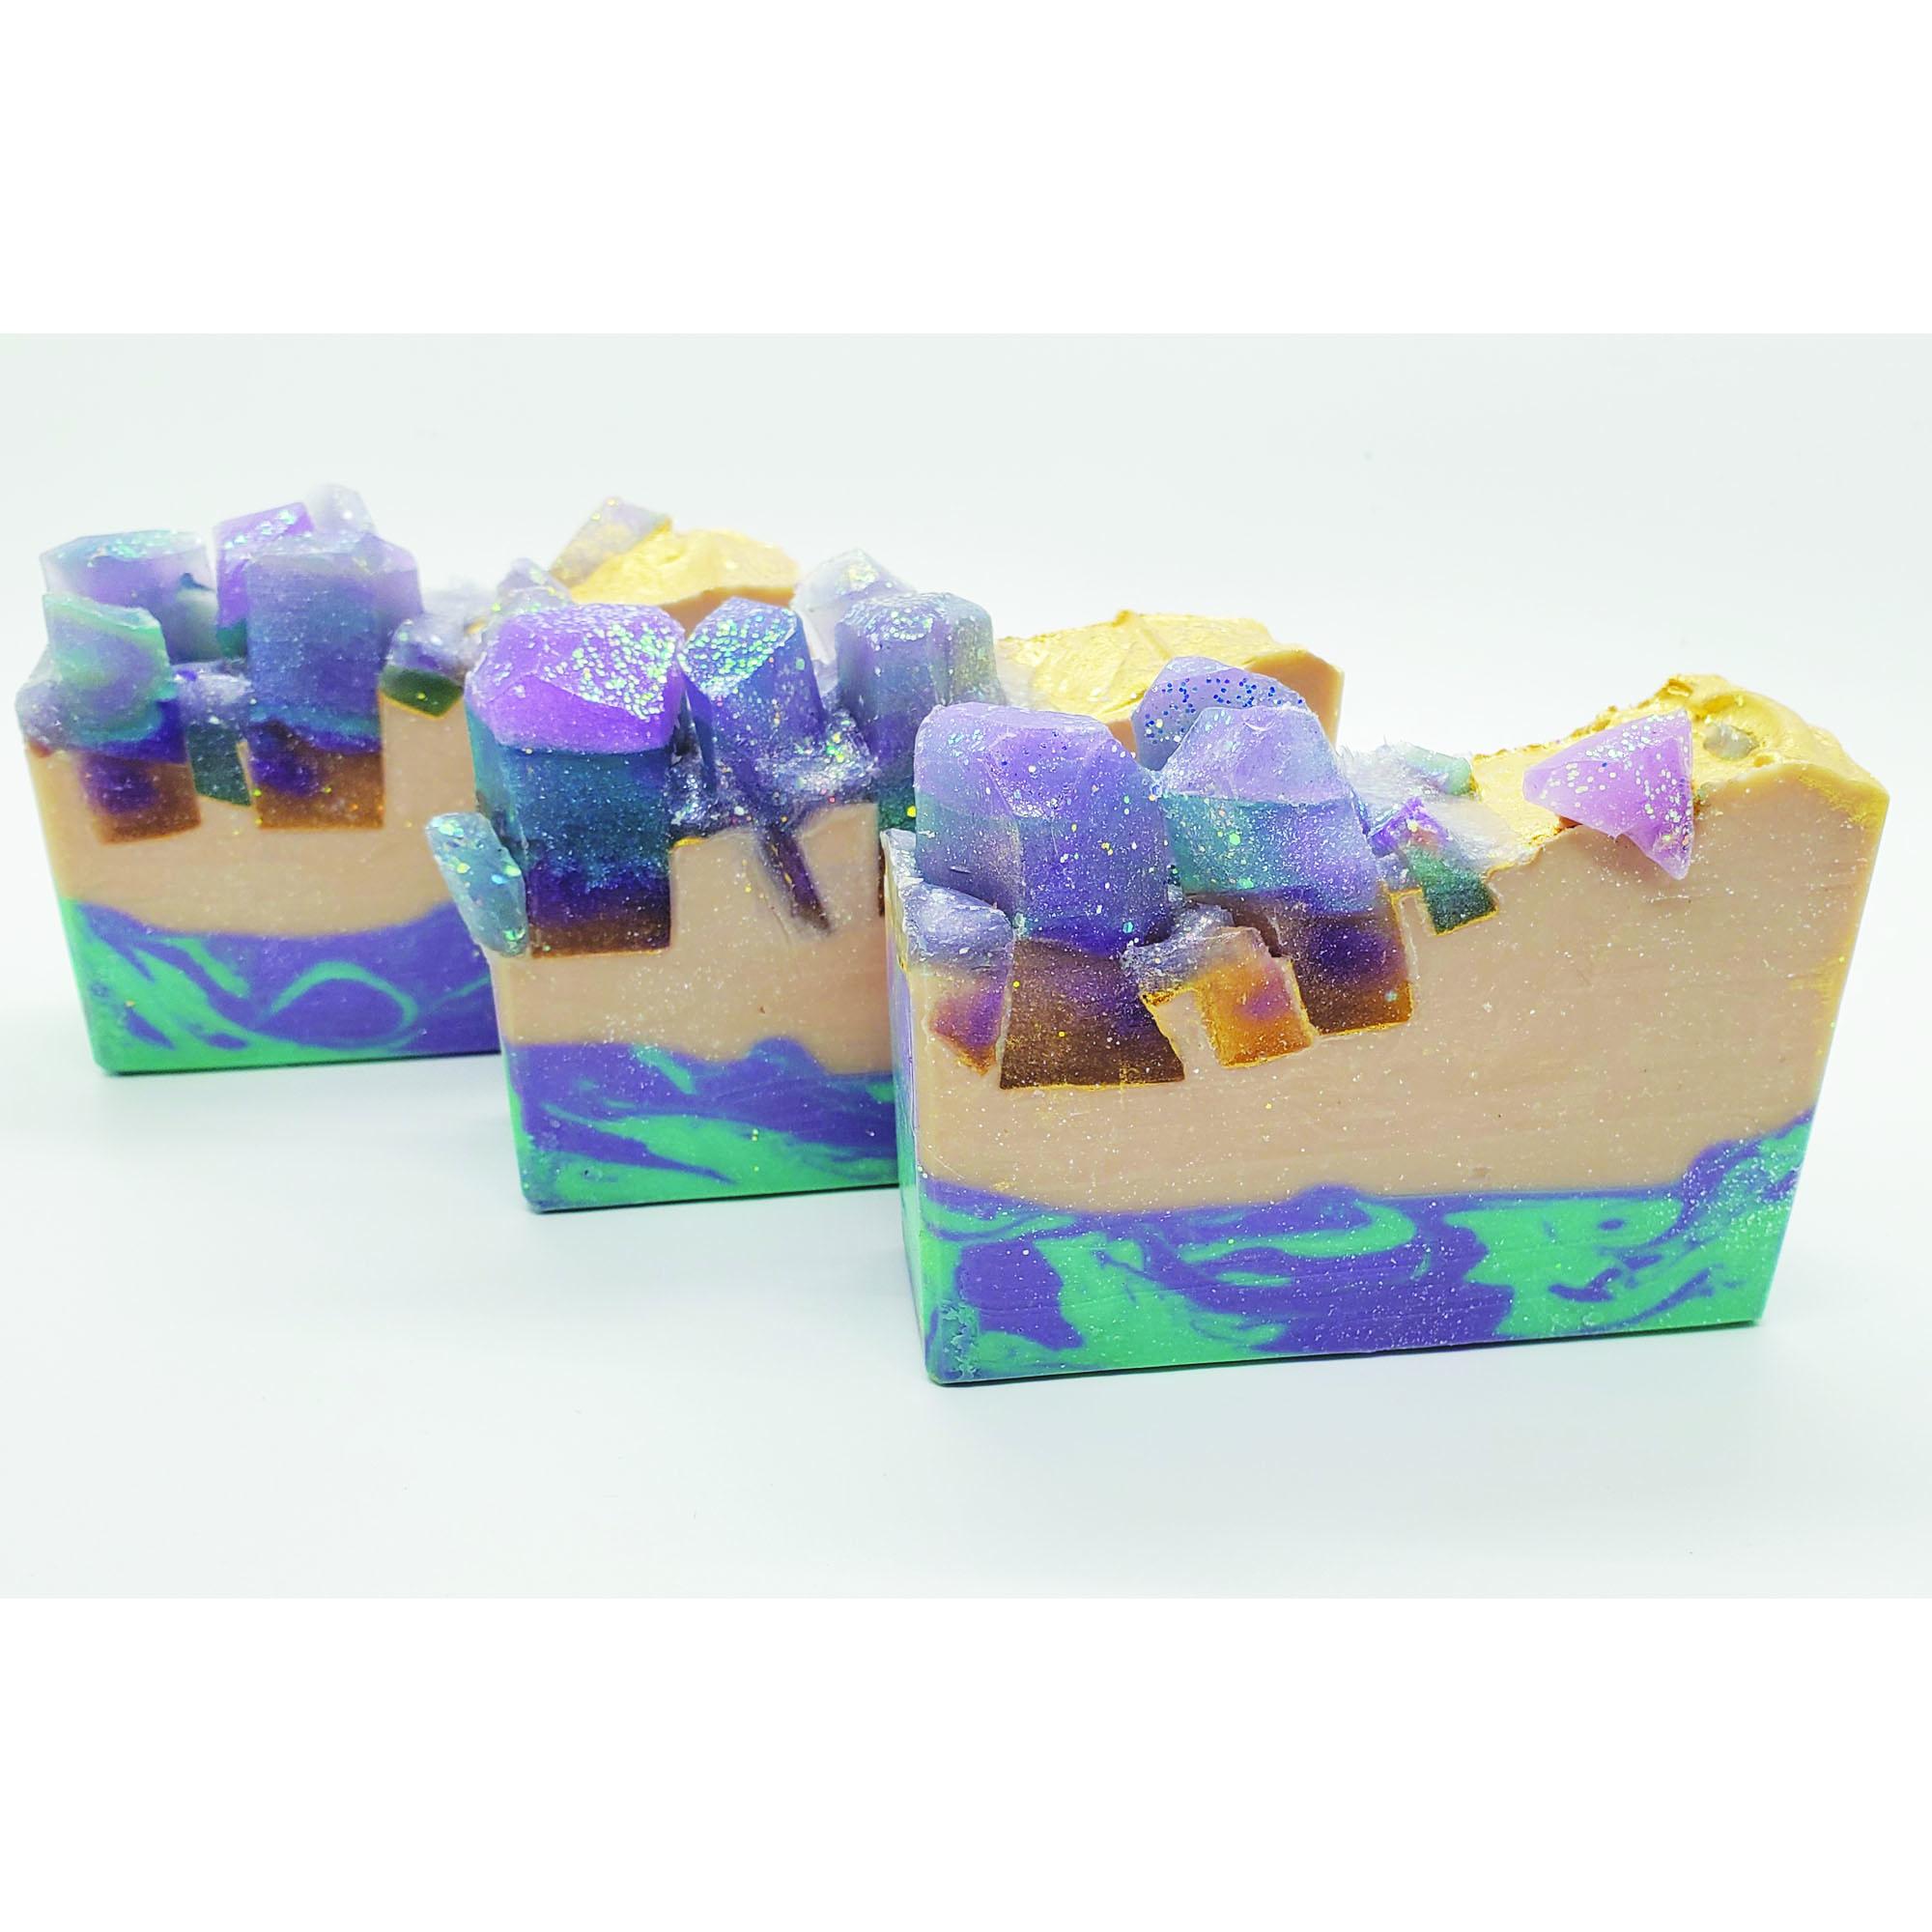 fluorite crystals soap